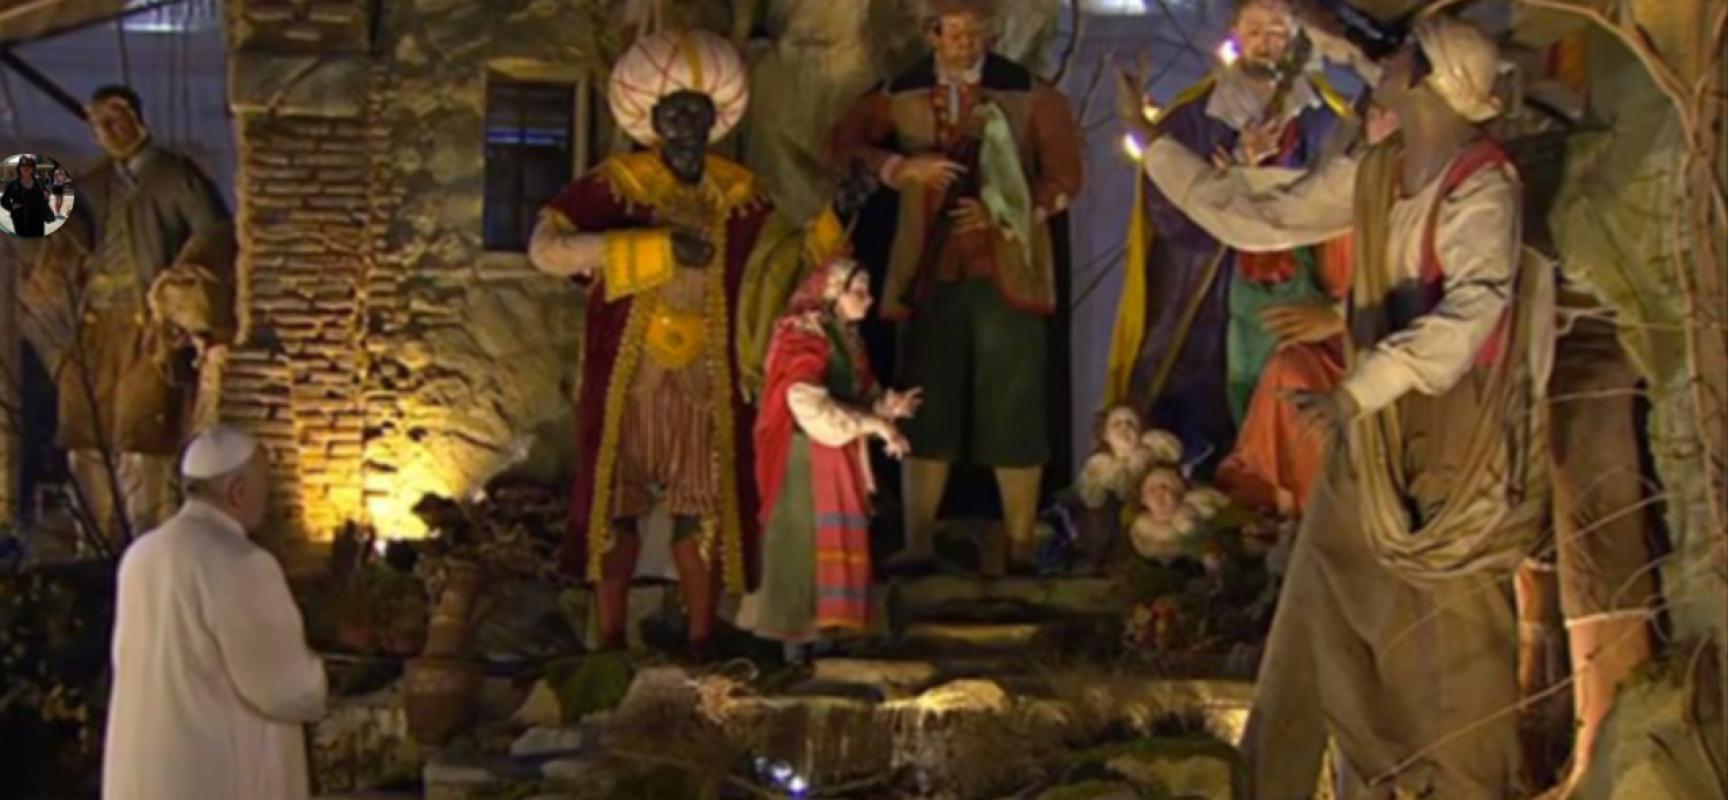 Natale 2015, Basilica San Francesco di Assisi presepe napoletano